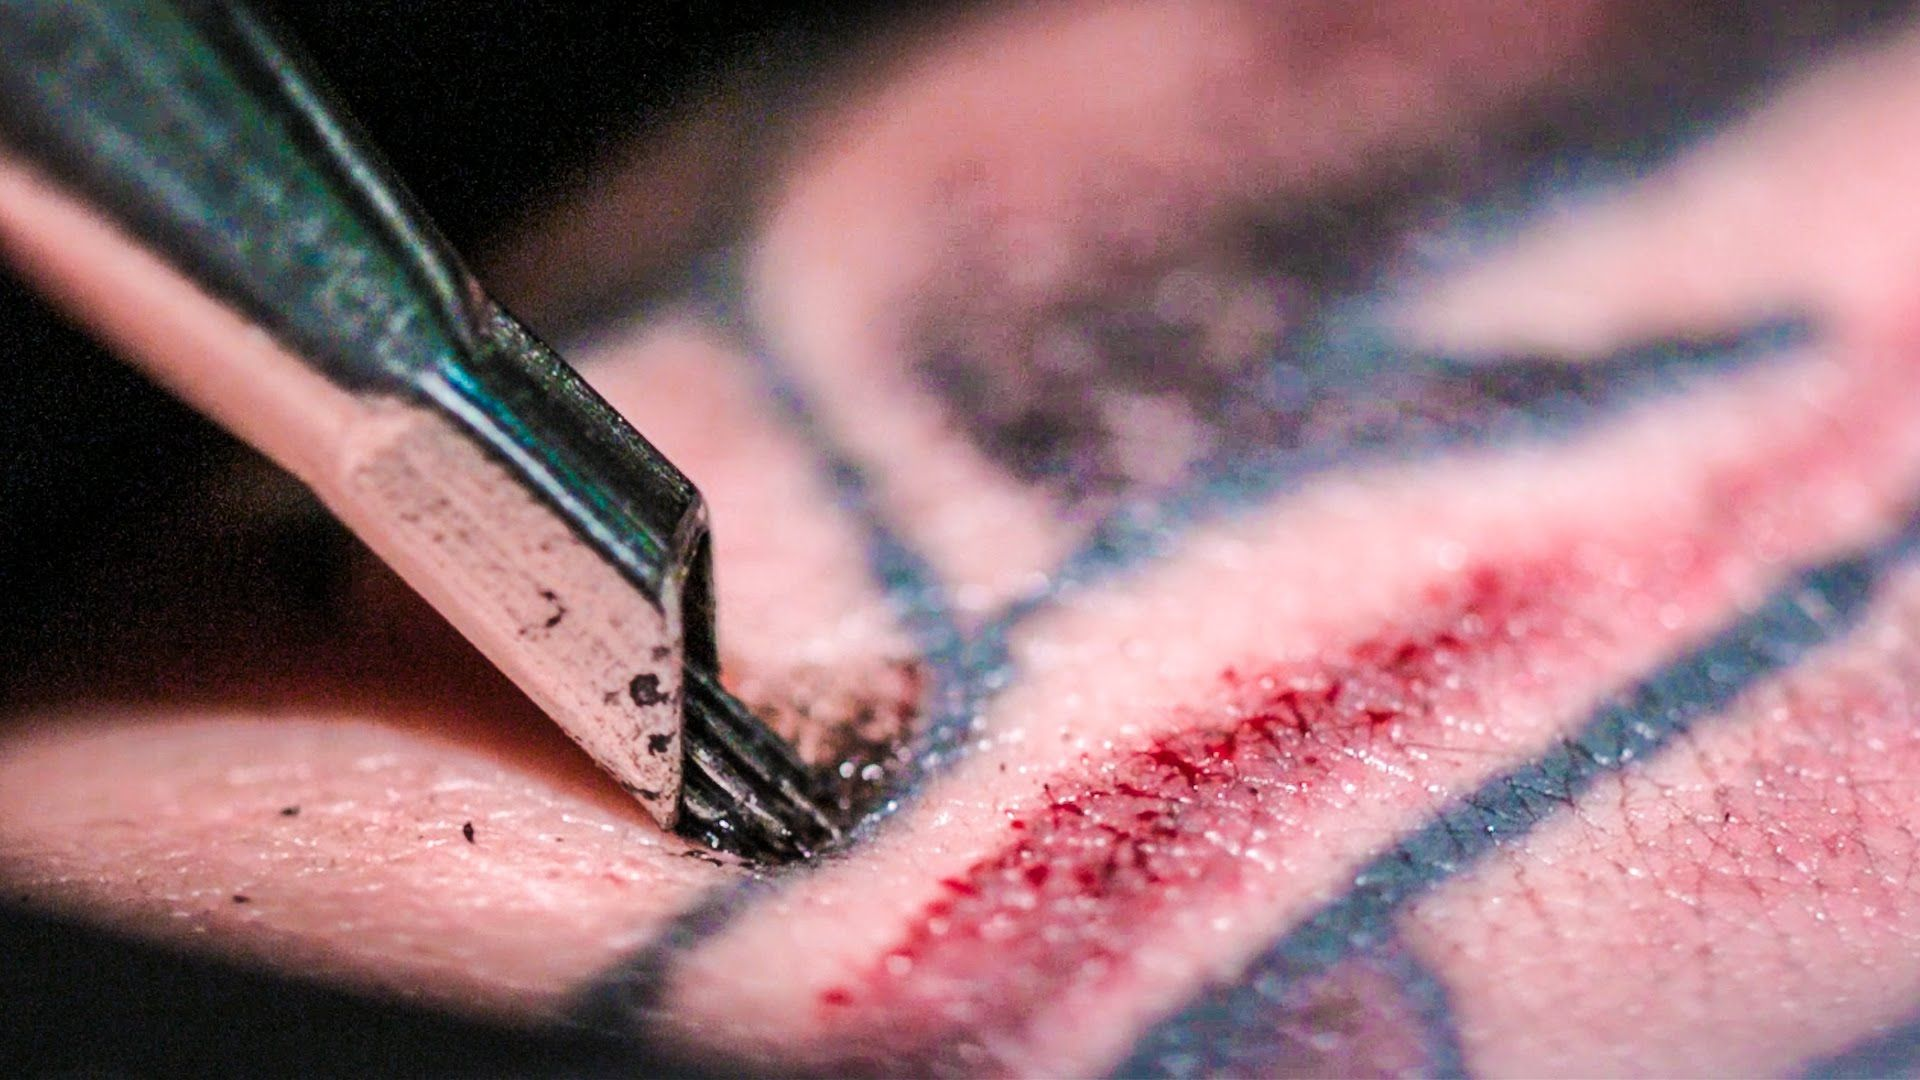 Tattoos and Body Piercing laurelkreuter on Pinterest